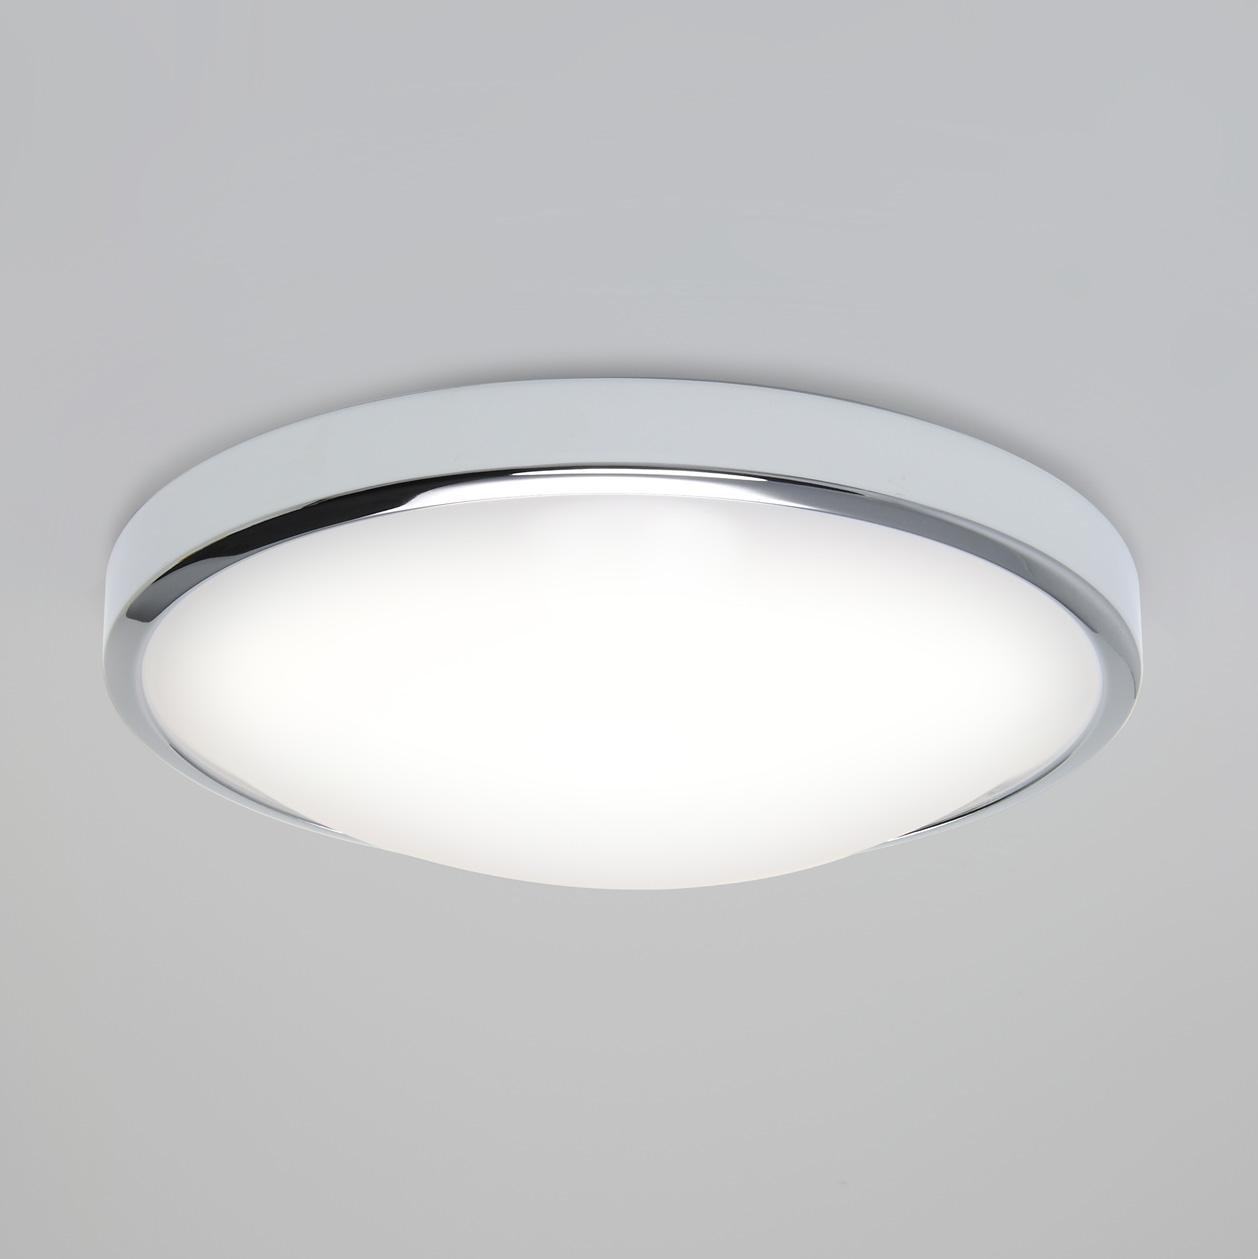 Bathroom Ceiling Lights Low Energy : Low energy bathroom ceiling light chrome w d pin